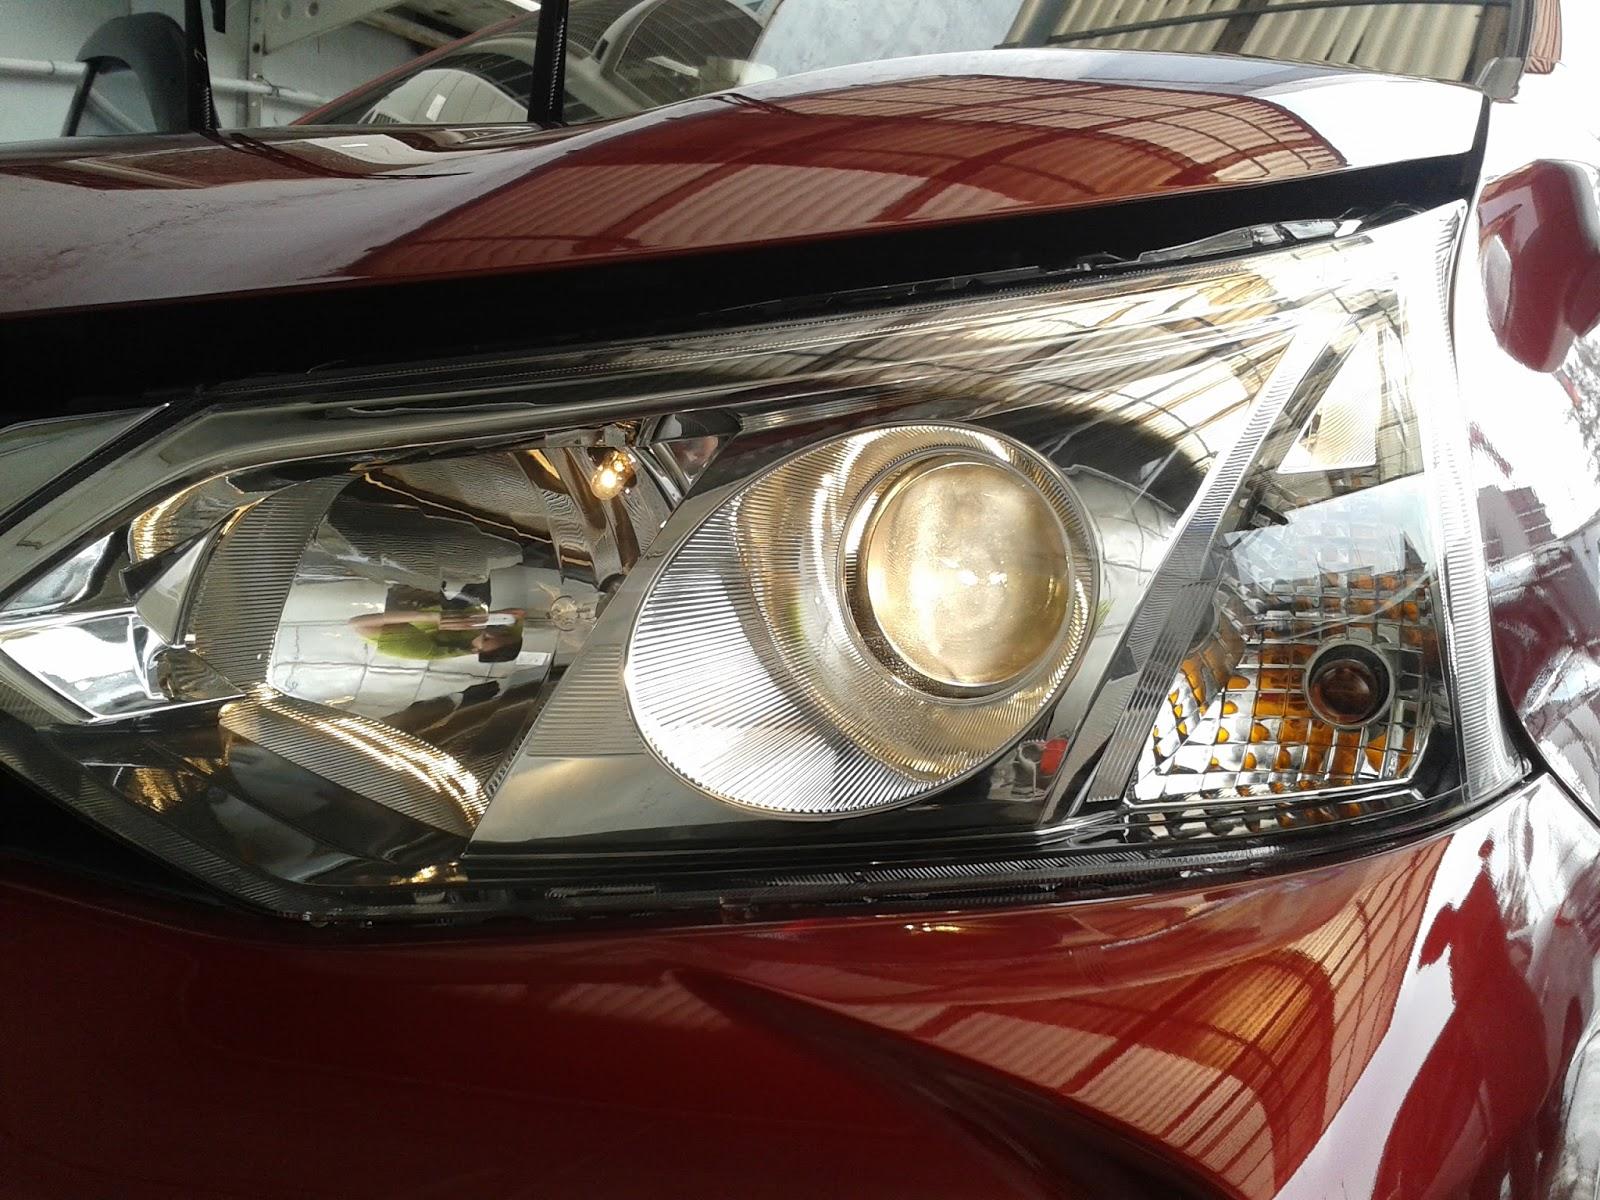 Jual Bumper Grand New Veloz Avanza Baru Koleksi 99 Lampu Belakang Terupdate Modispik Motor Plaza Toyota Kyai Tapa 2015